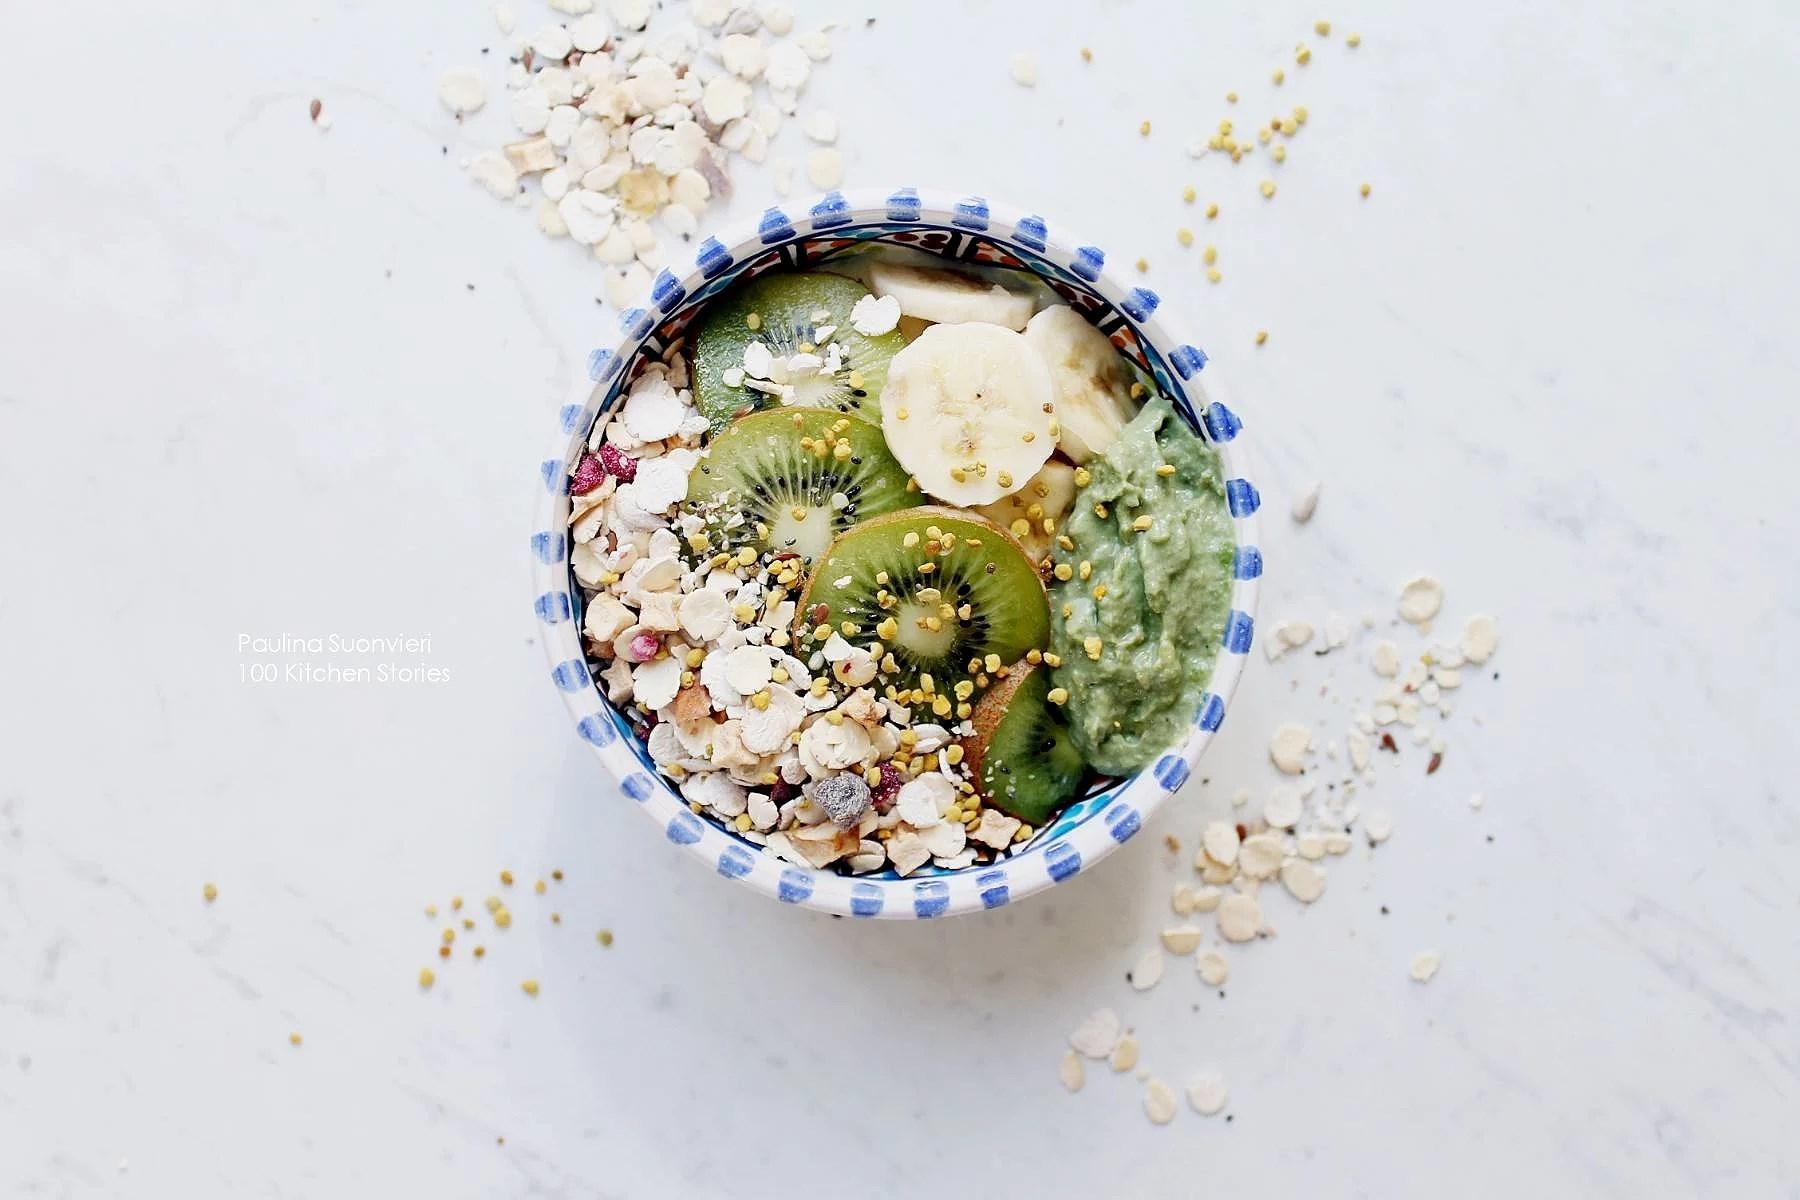 Vegan Oatmeal with Protein Rich Granola, Bee Pollen & Raw Avocado Cream